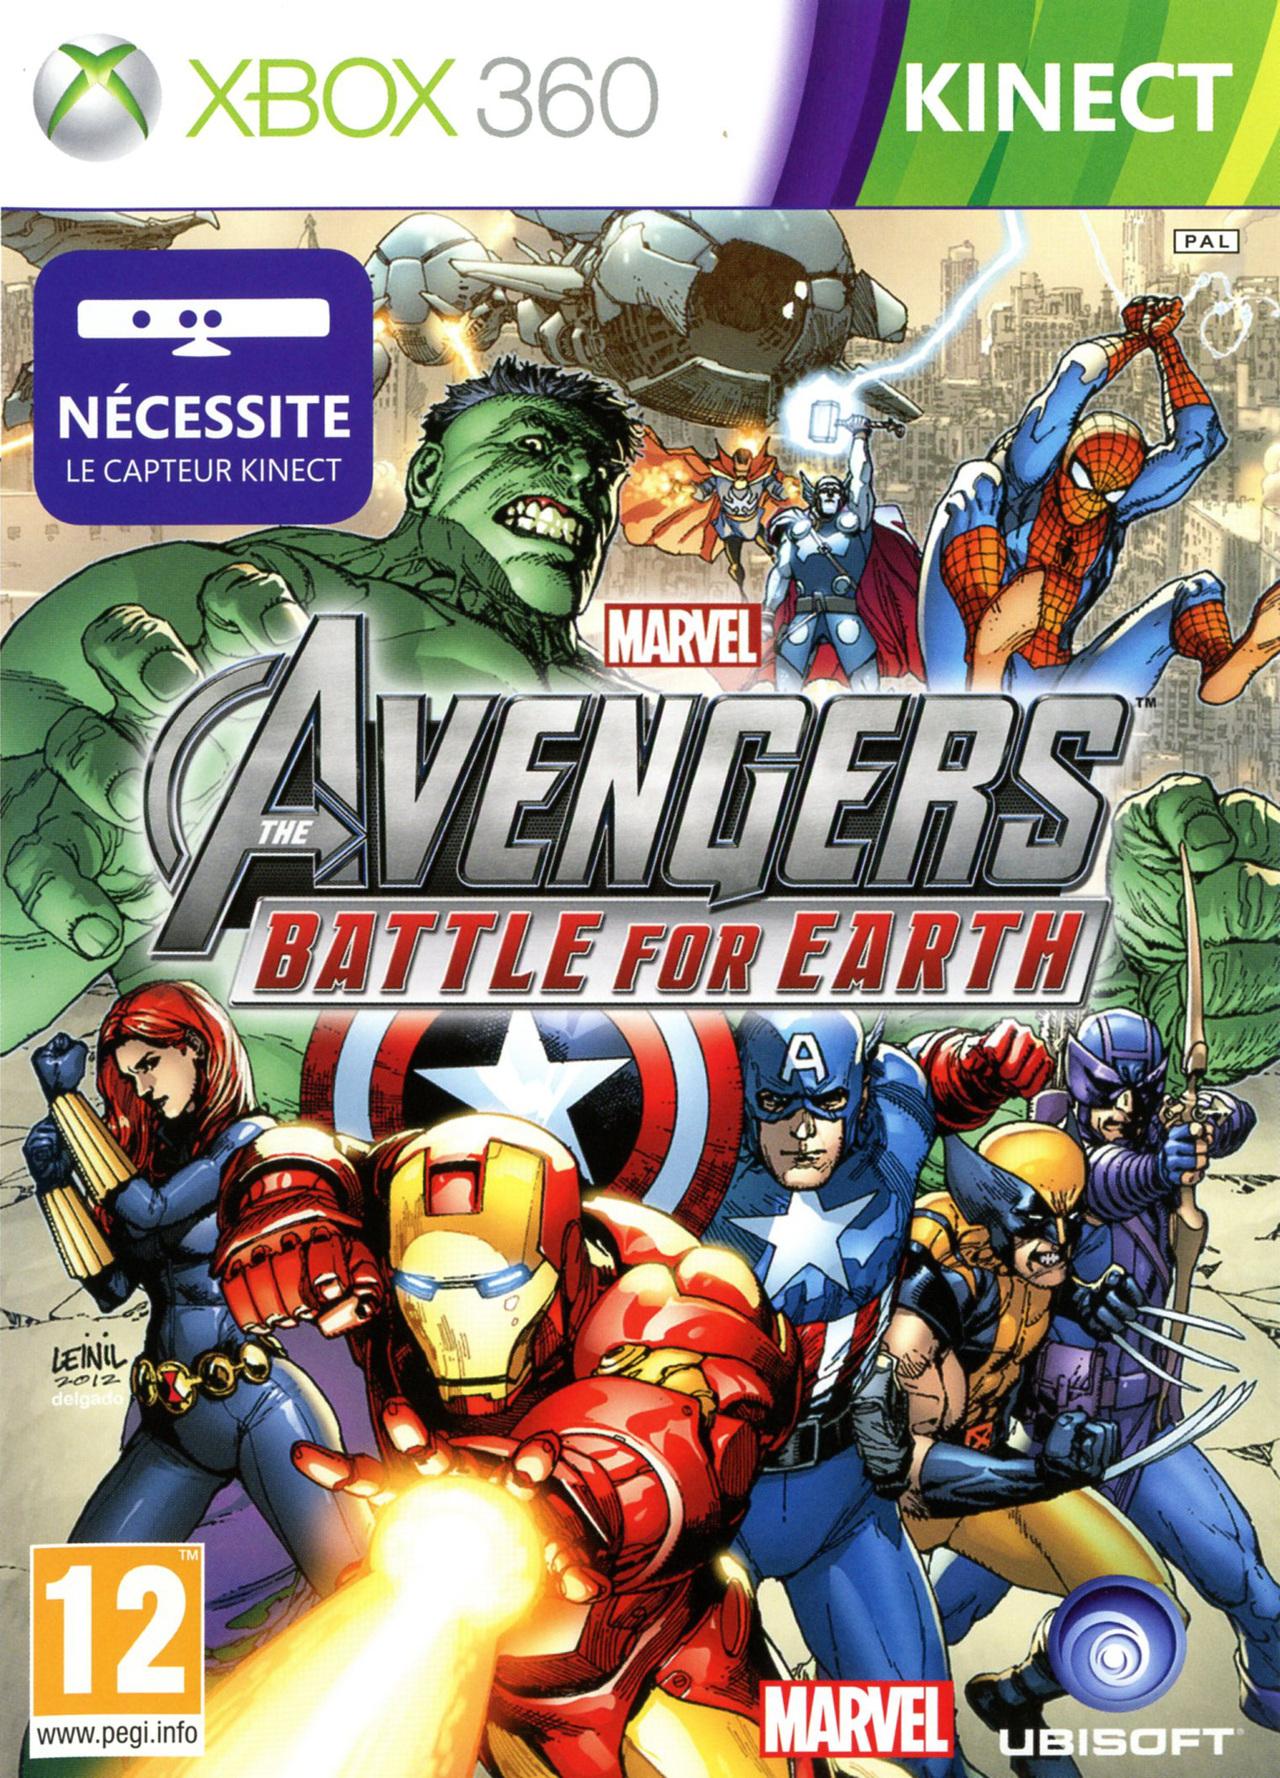 MarvelAvengers-BattleforEarth 360 Jaquette 002